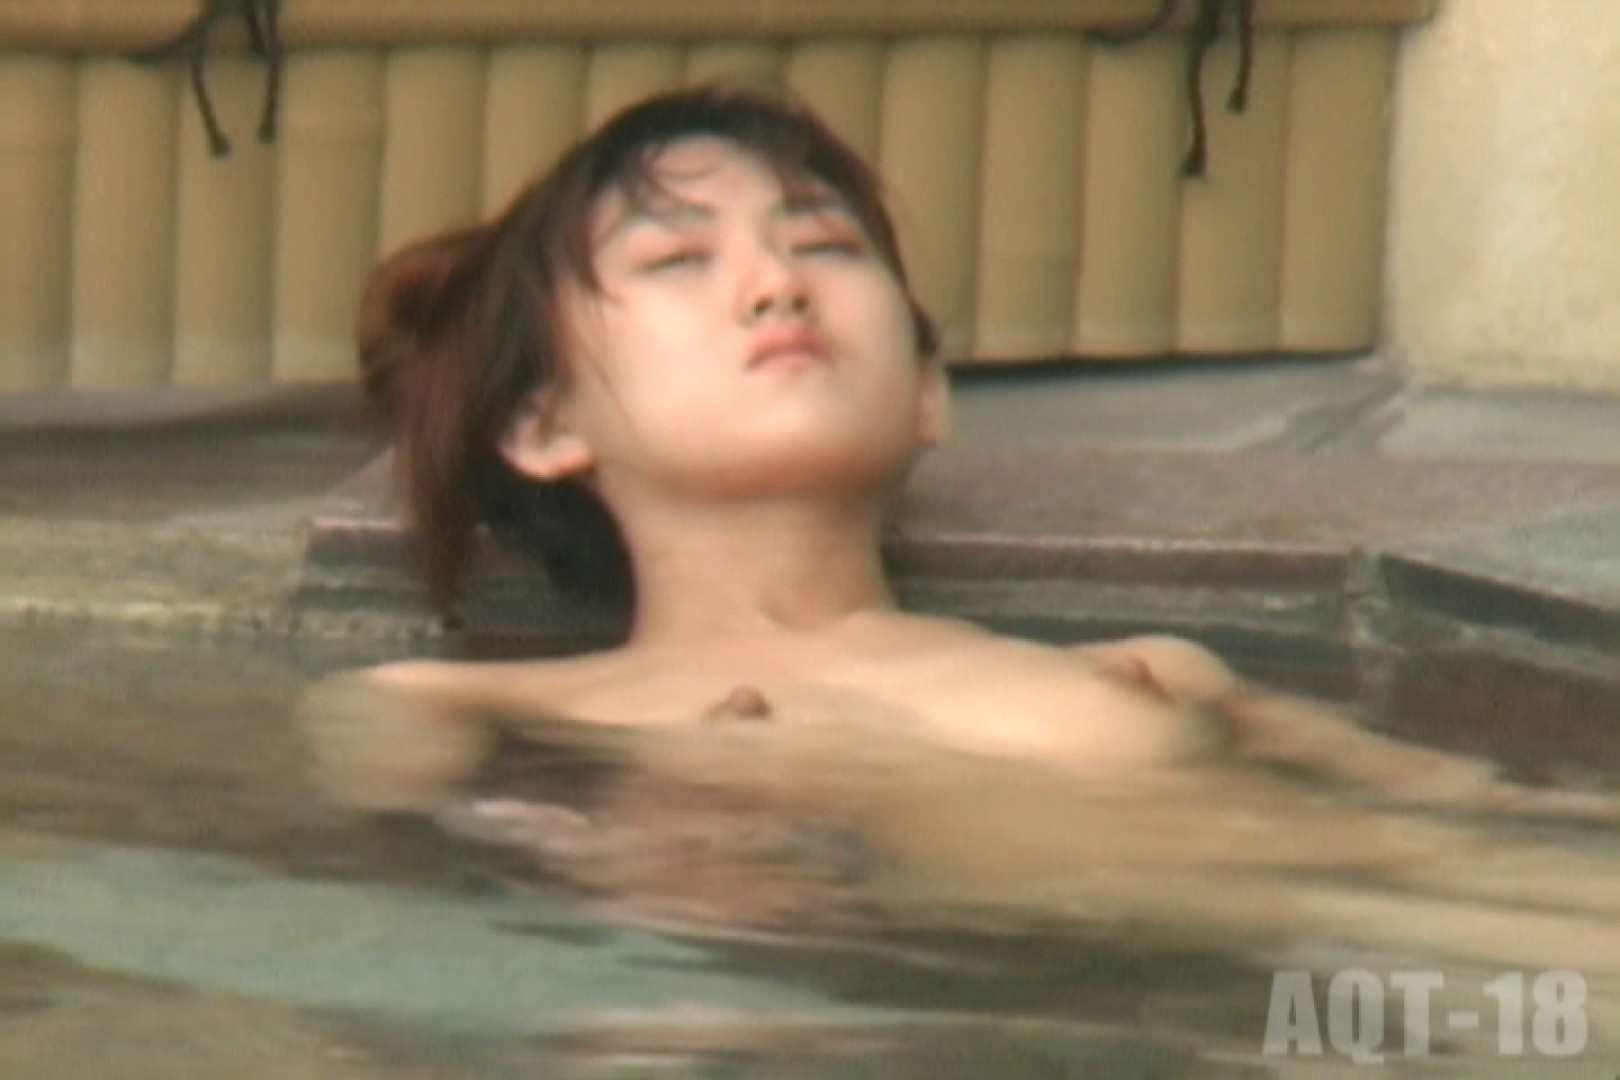 Aquaな露天風呂Vol.862 美しいOLの裸体 戯れ無修正画像 99pic 5